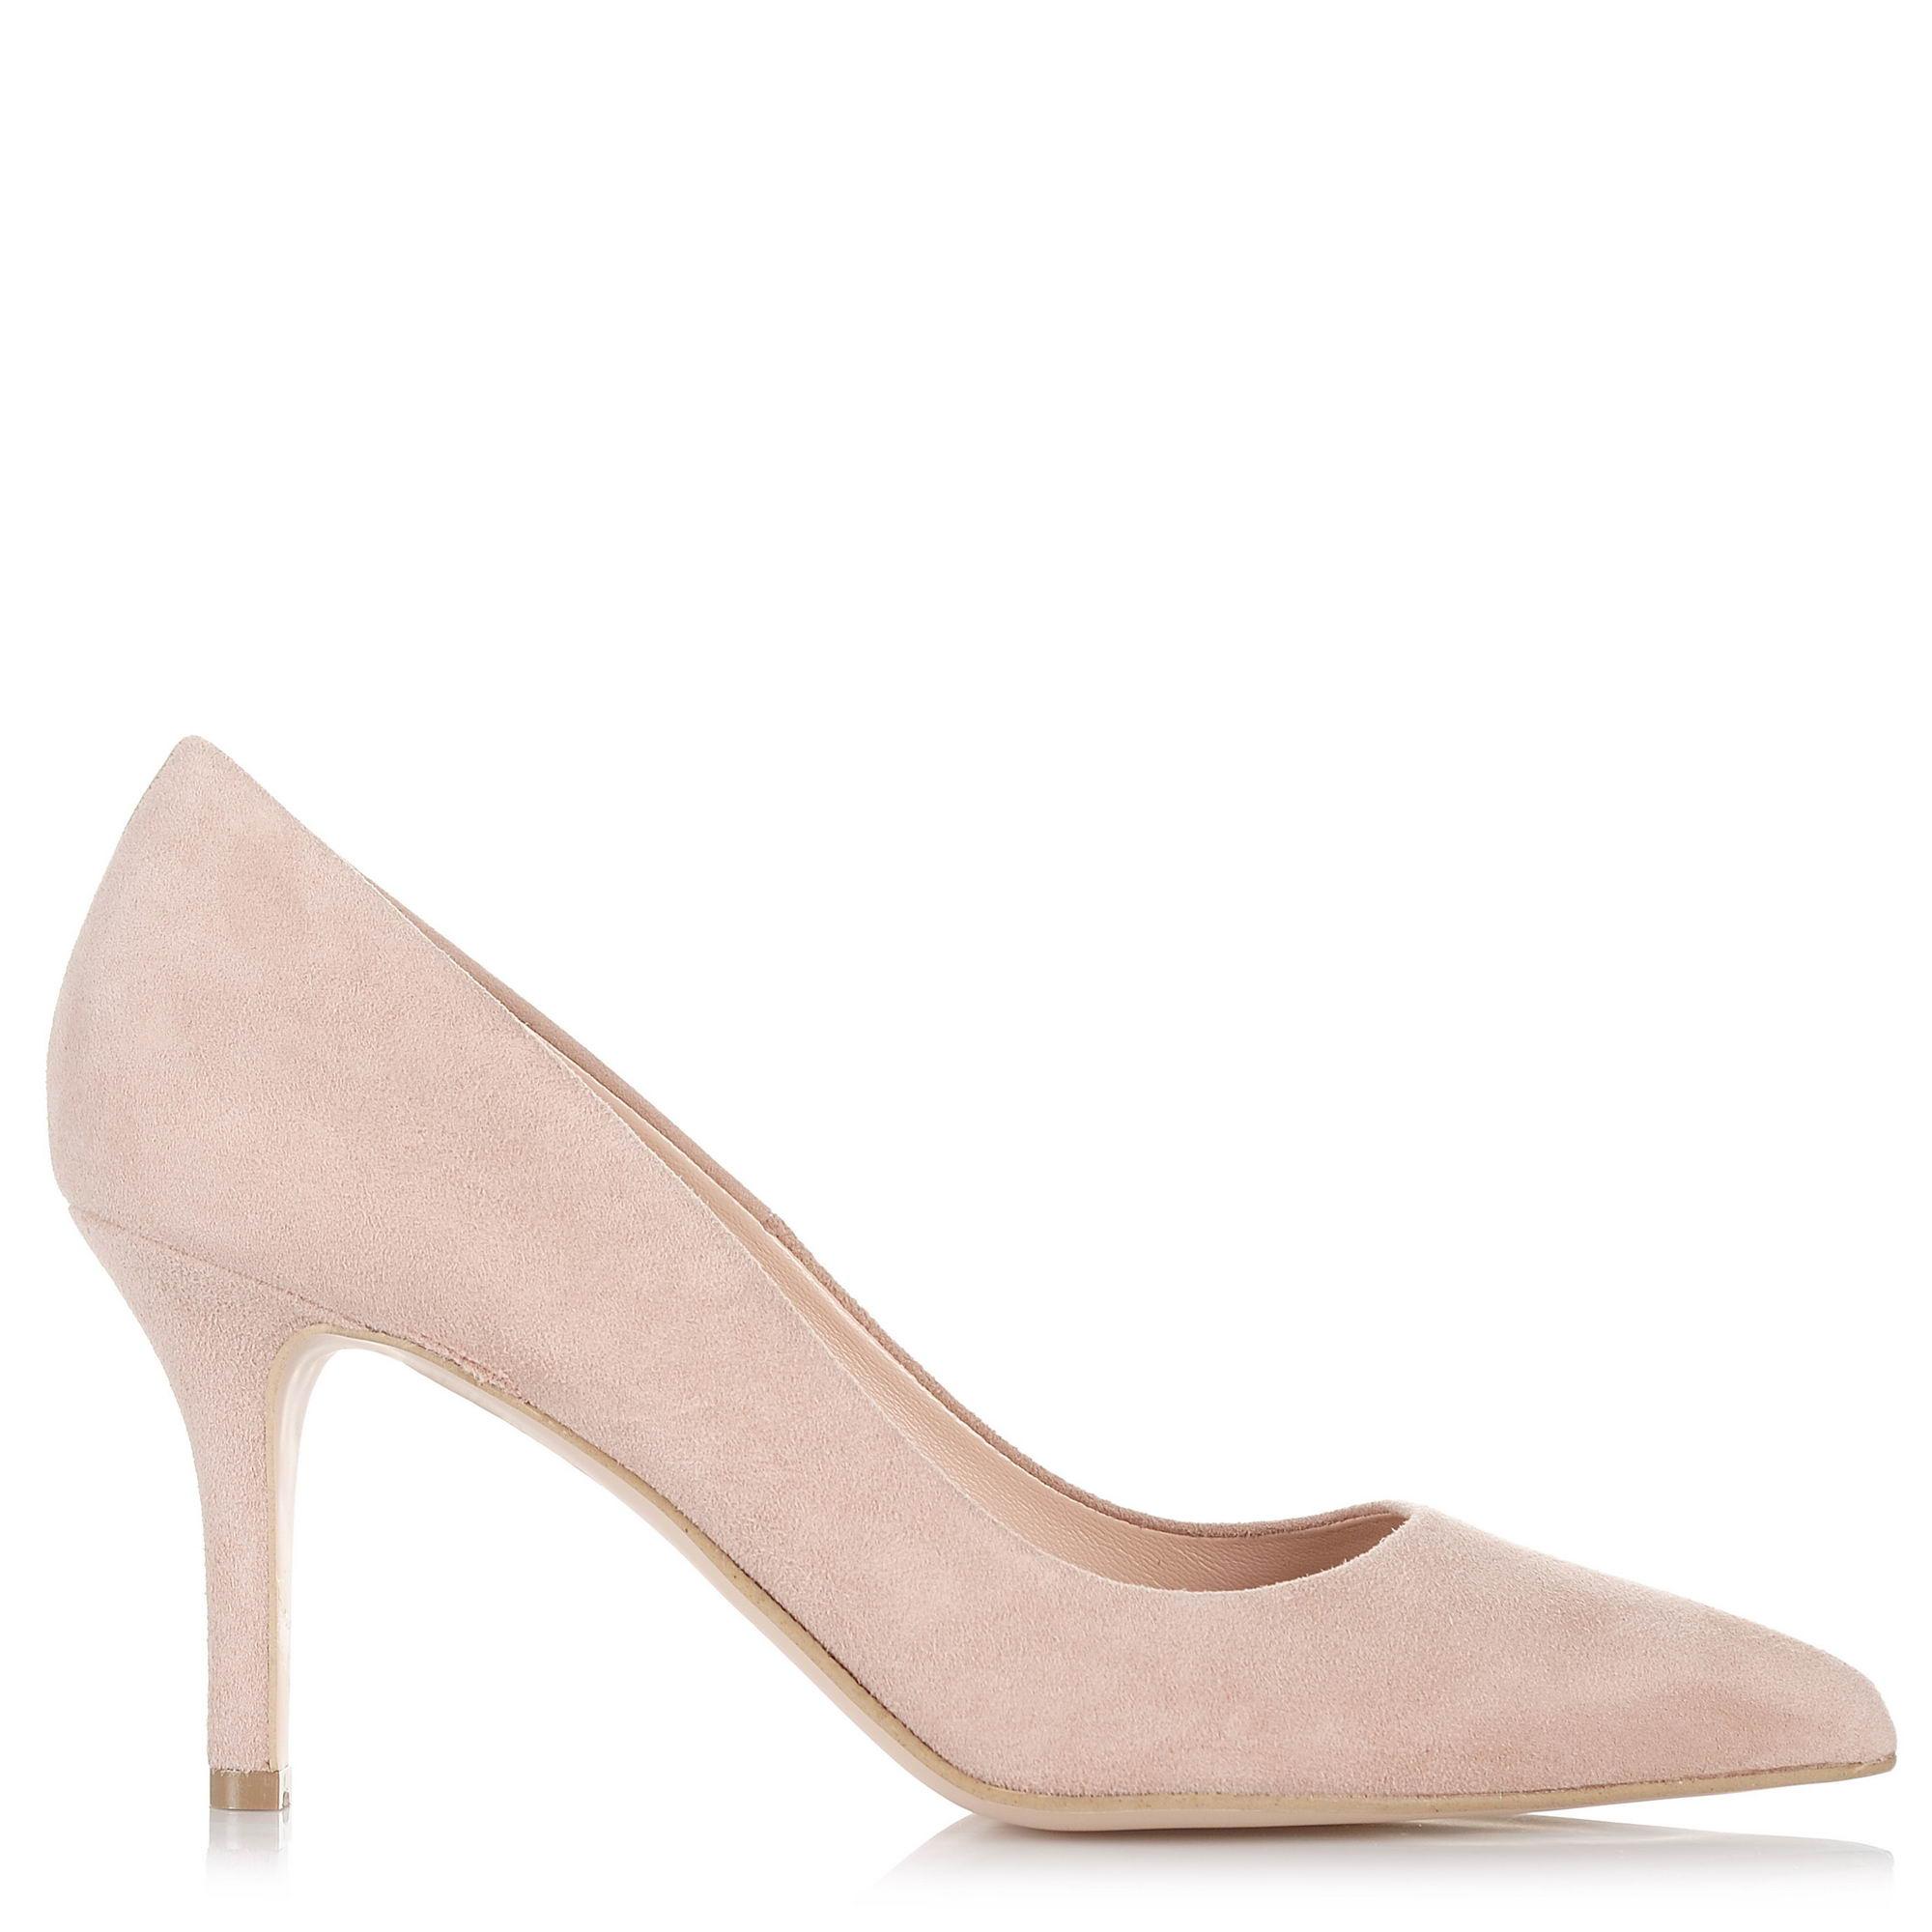 Suede Δερμάτινες Γόβες Mourtzi 7/71100 γυναικα   γυναικείο παπούτσι